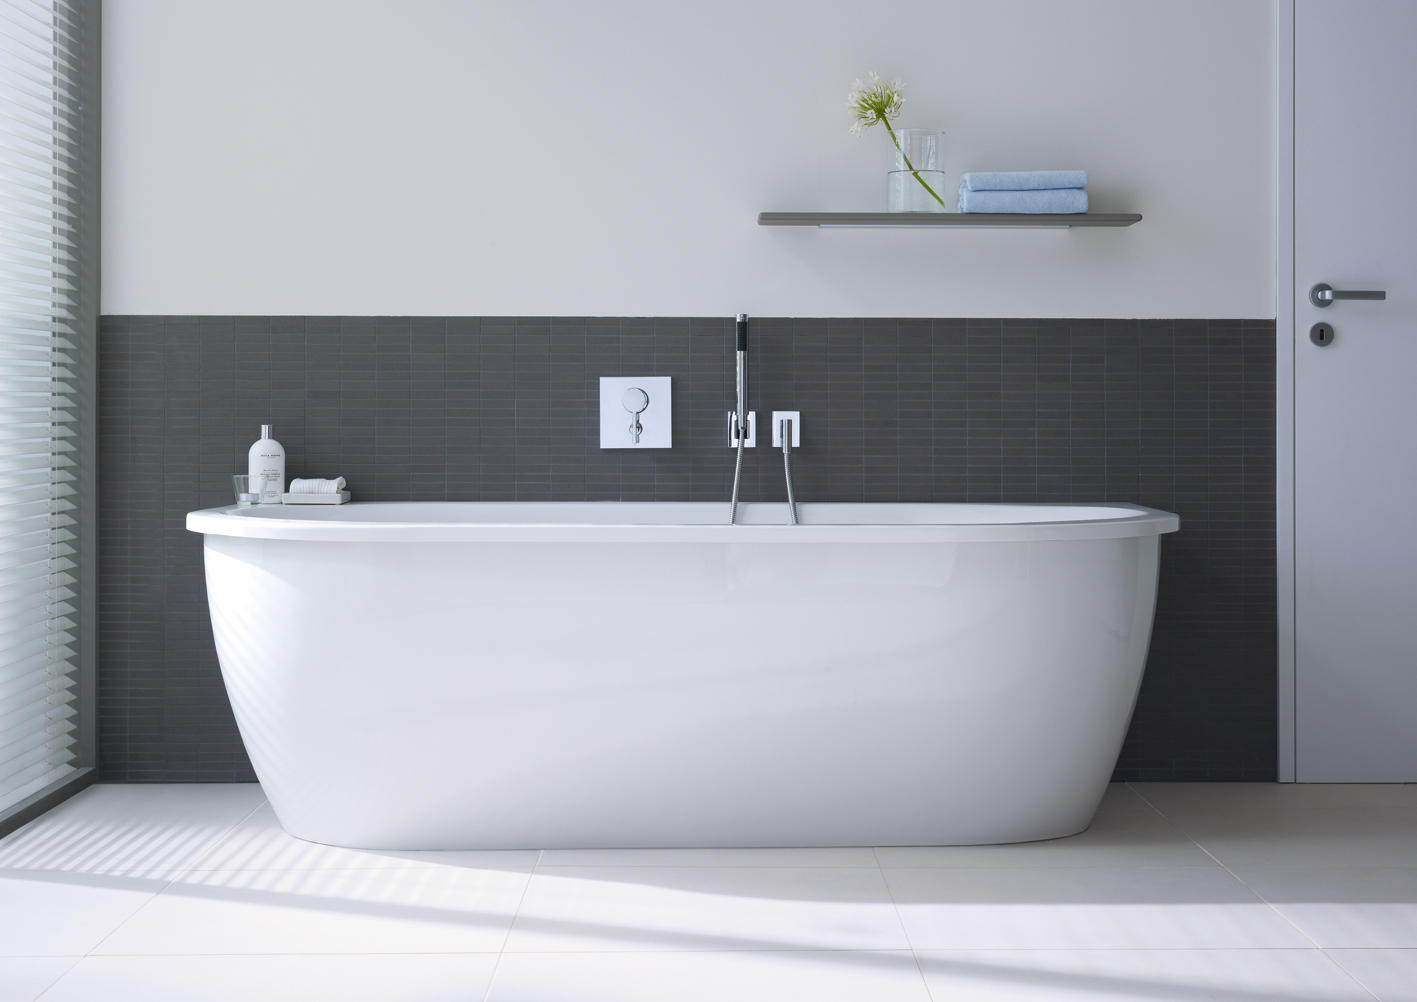 Vasche Da Bagno Quadrate : Vasca da bagno quadrata in metacrilato da incasso grande quadra